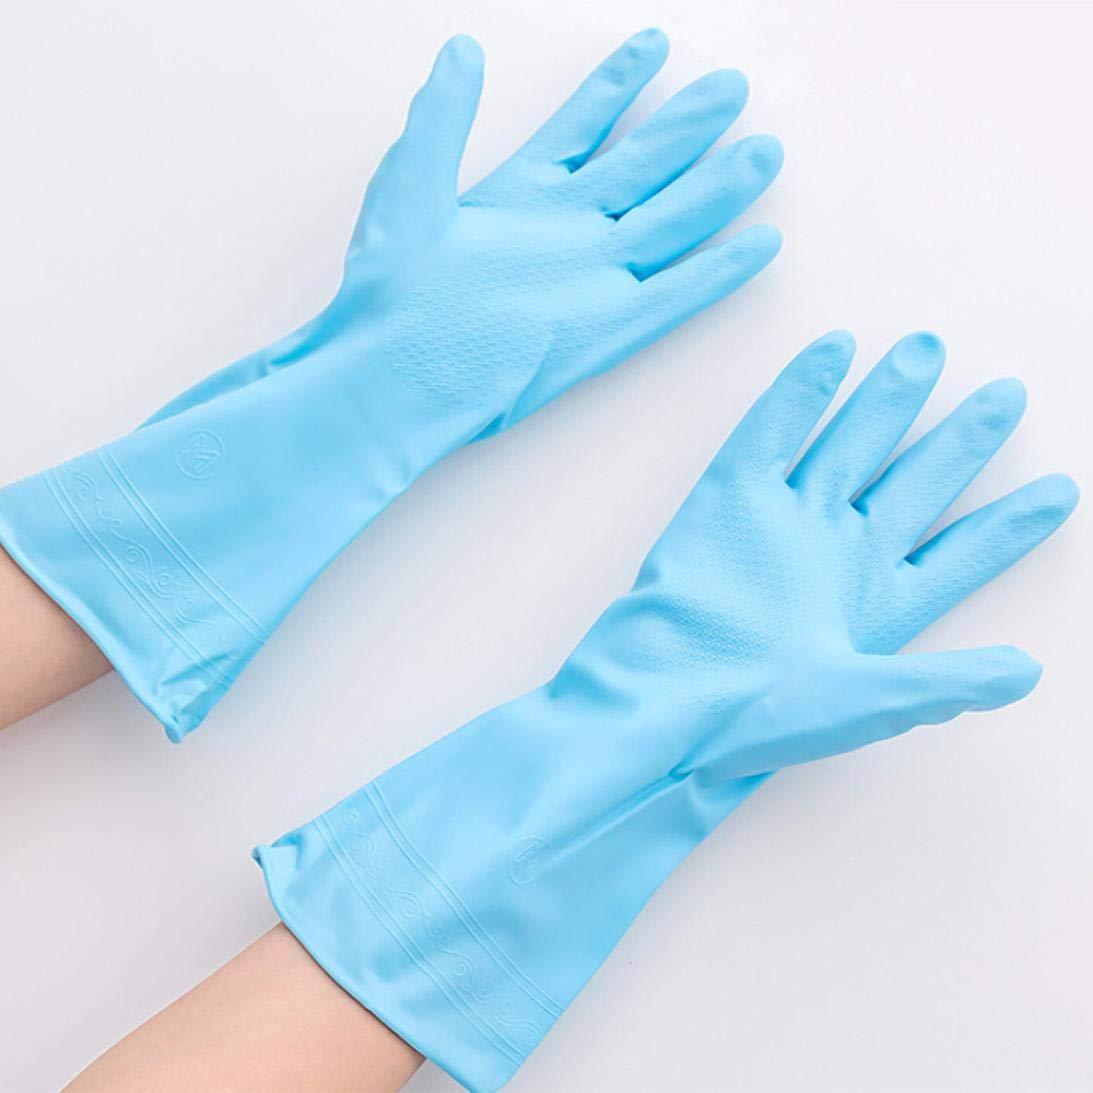 TAOtTAO - Guantes de látex de goma impermeables para lavado de platos: Amazon.es: Belleza